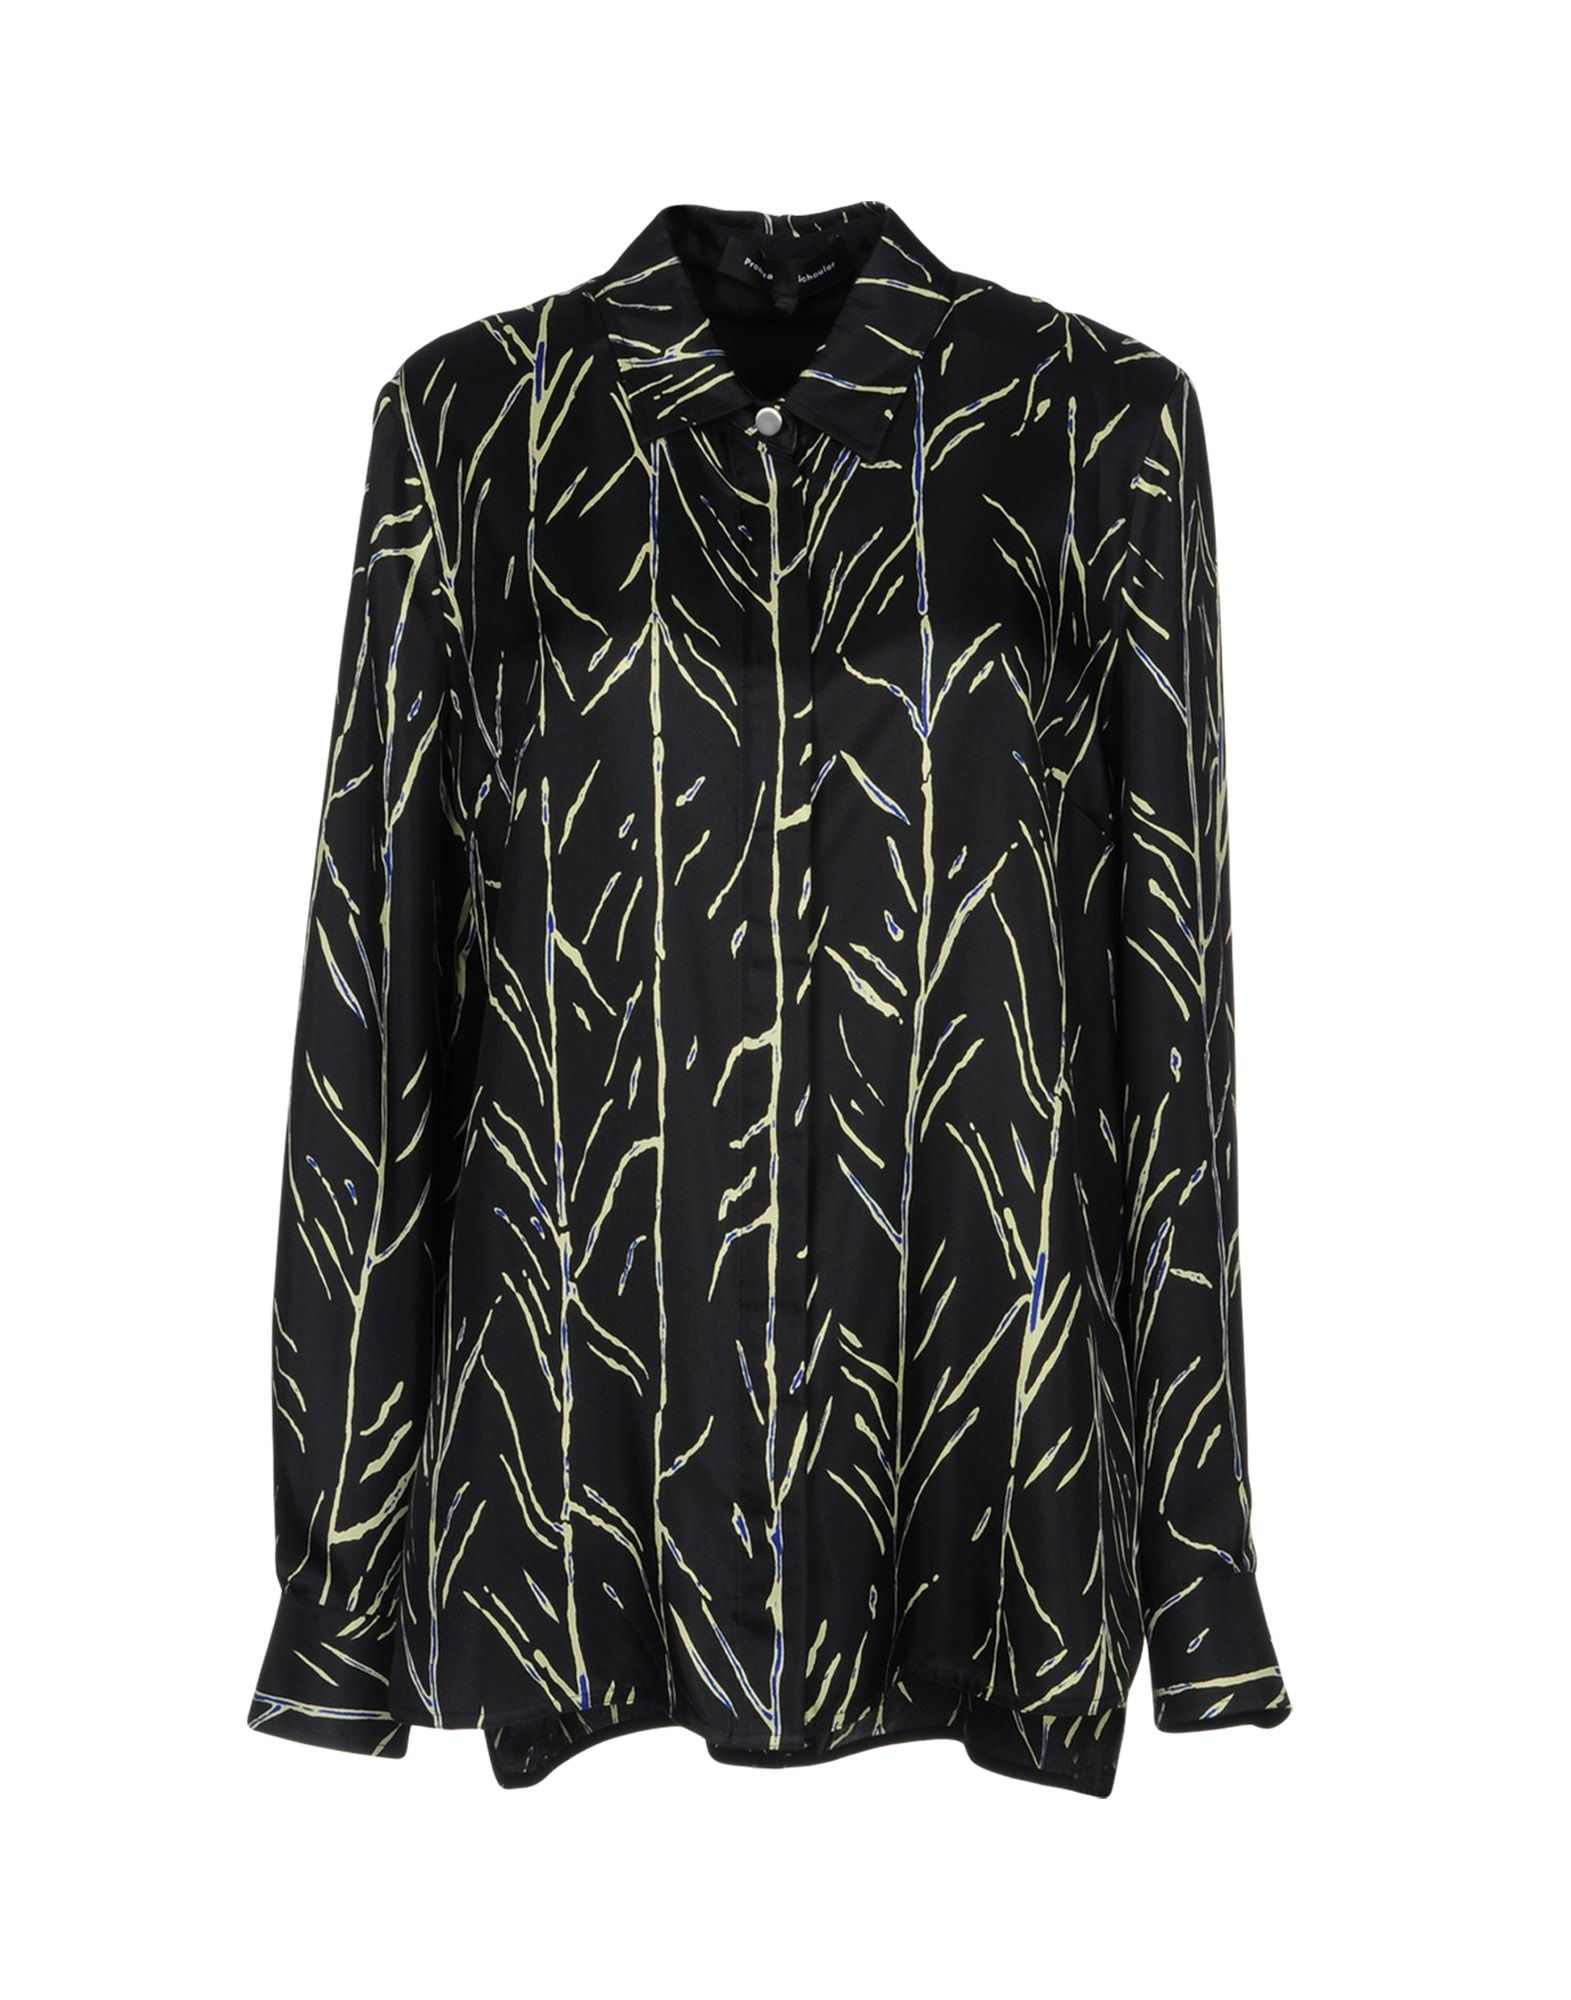 Camicie E Bluse Fantasia Proenza Schouler Donna - Acquista online su wNMP8Ab